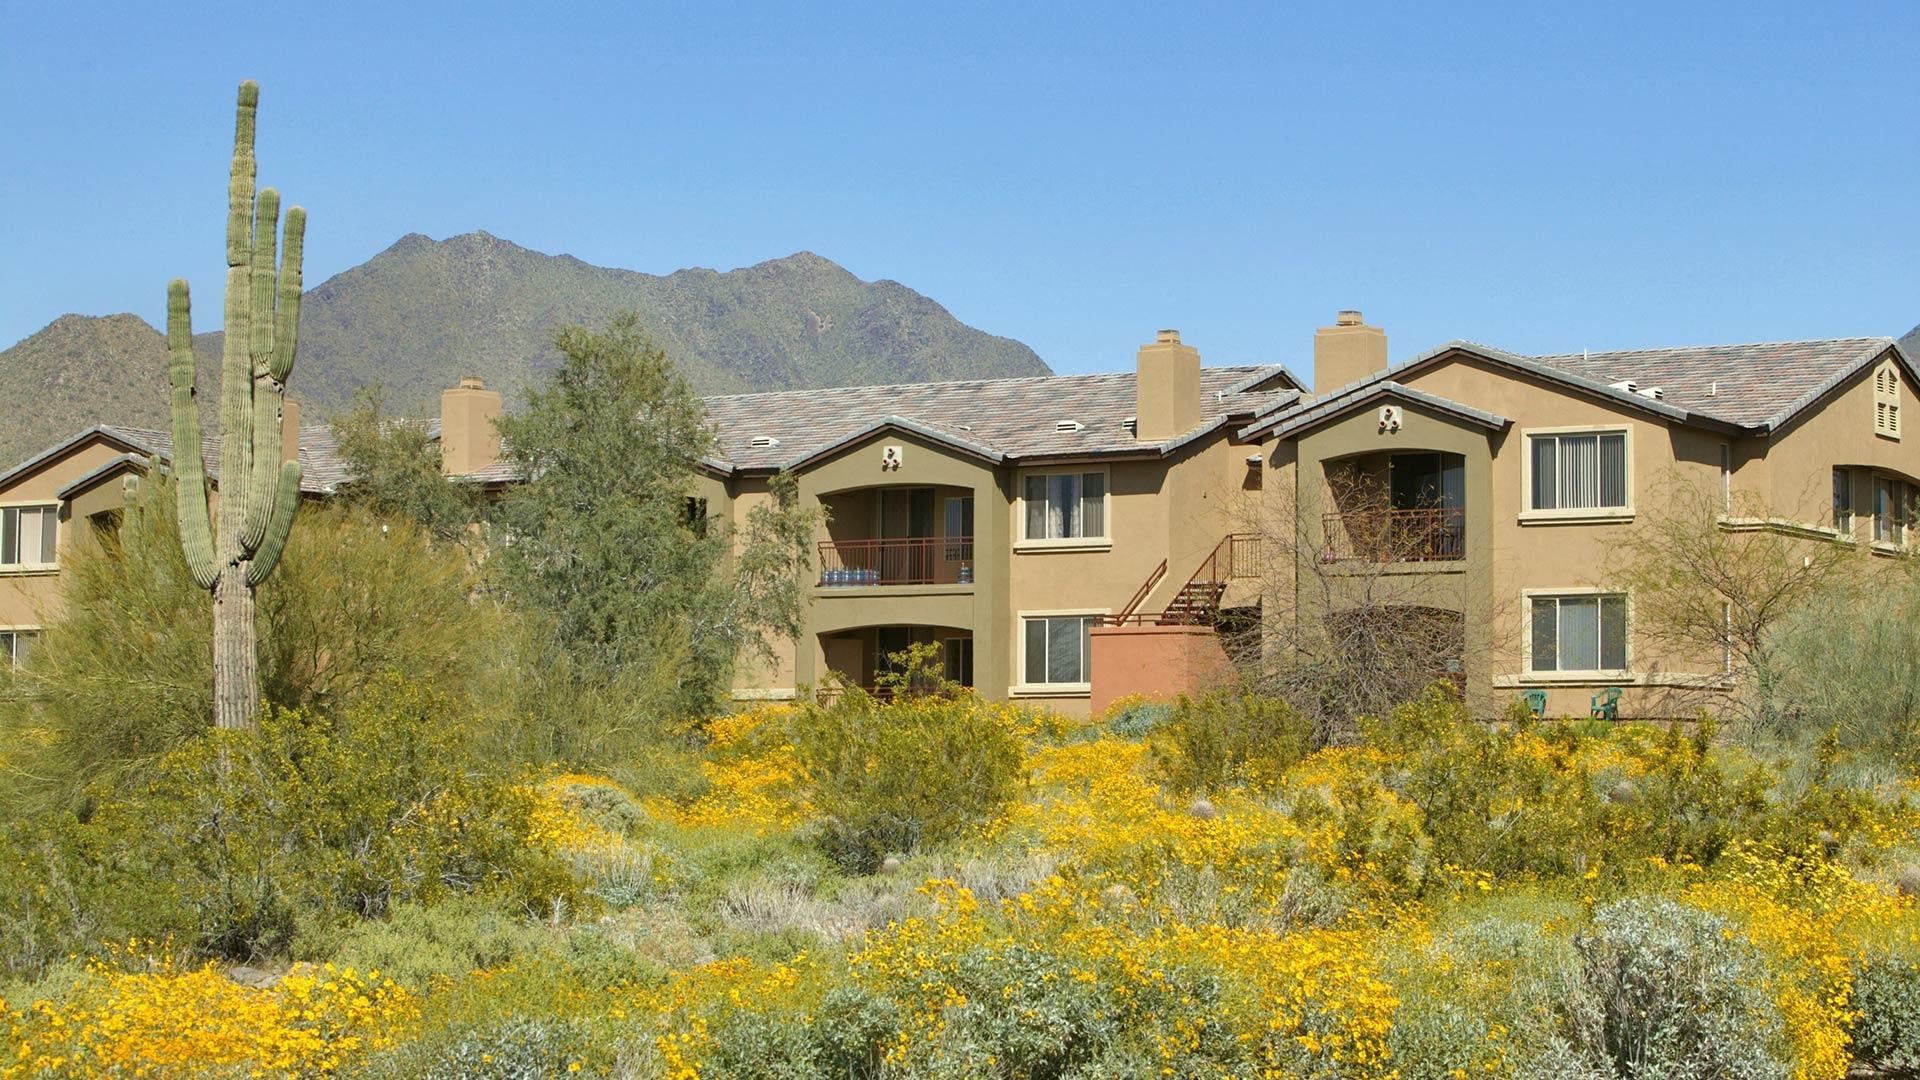 Dakota At Mcdowell Mountain Ranch In Scottsdale Az 888